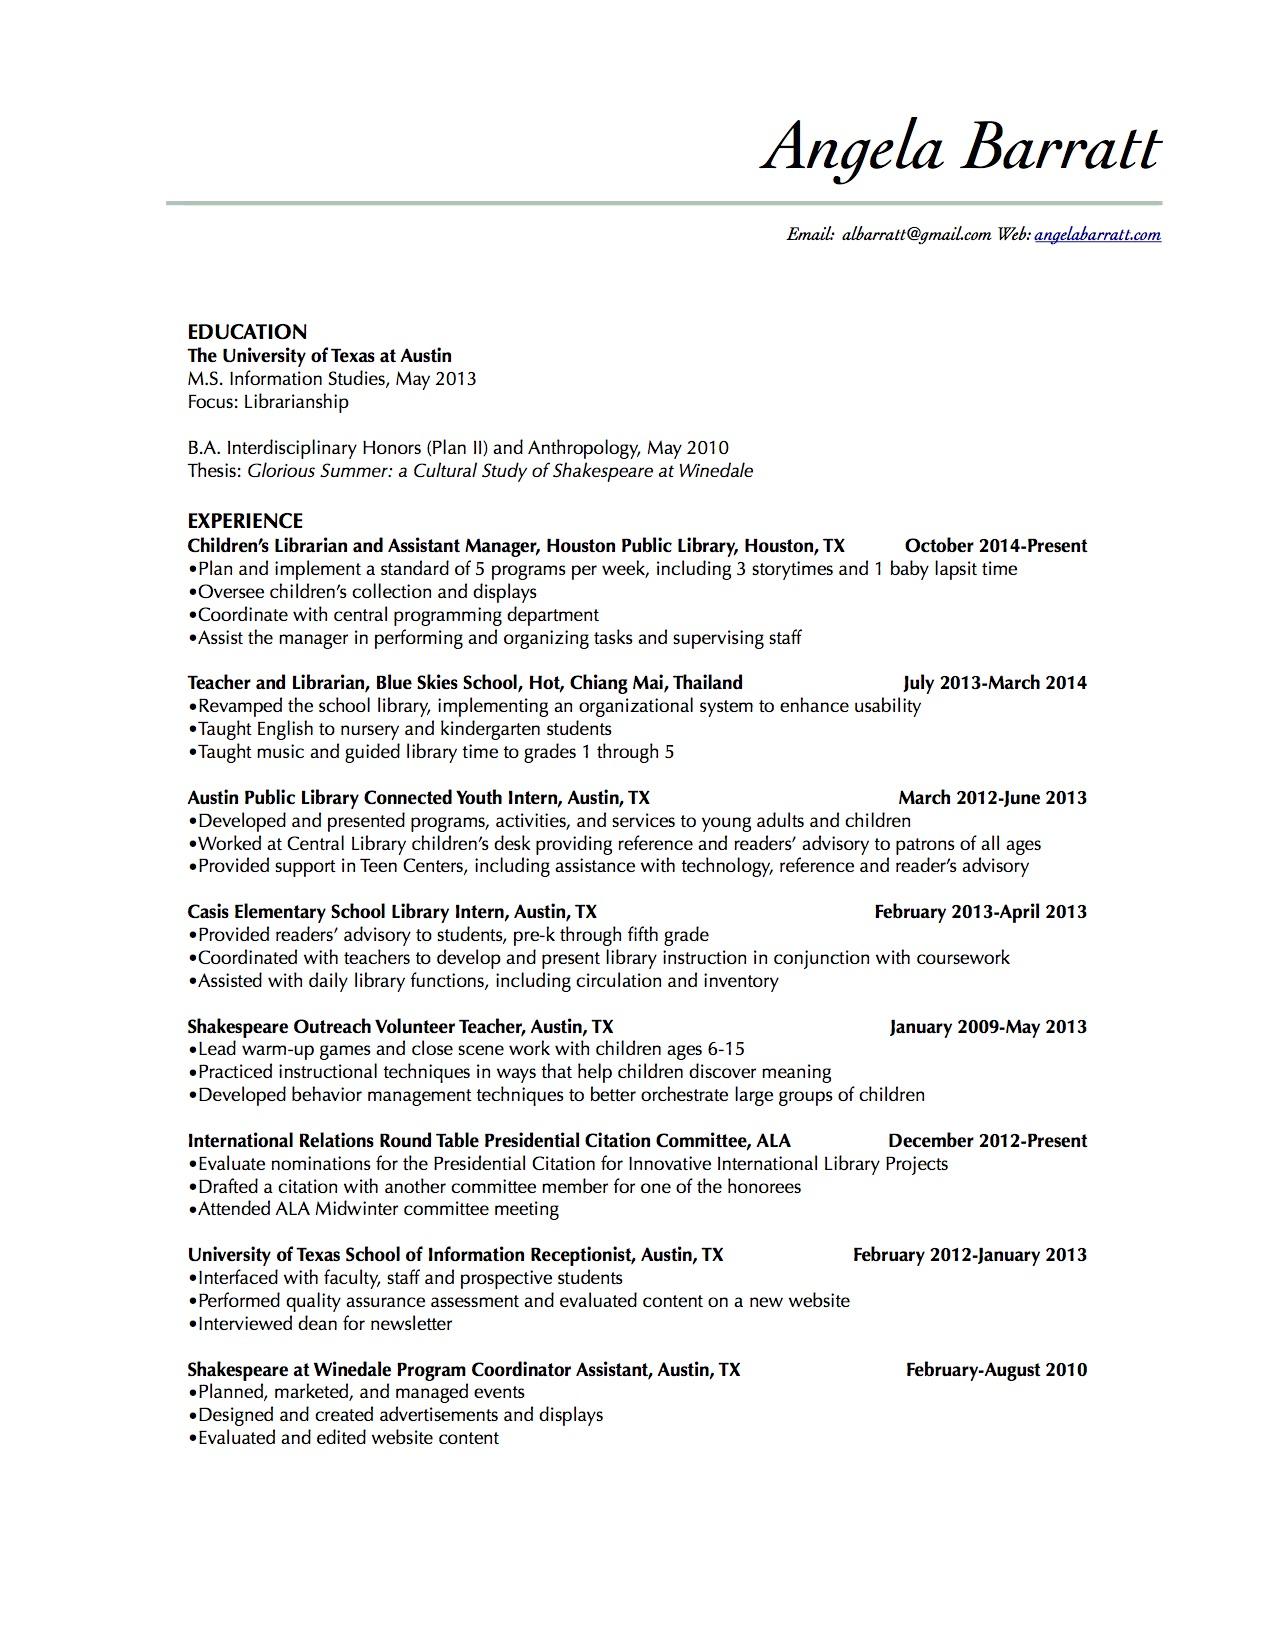 Resume Angela Barratt